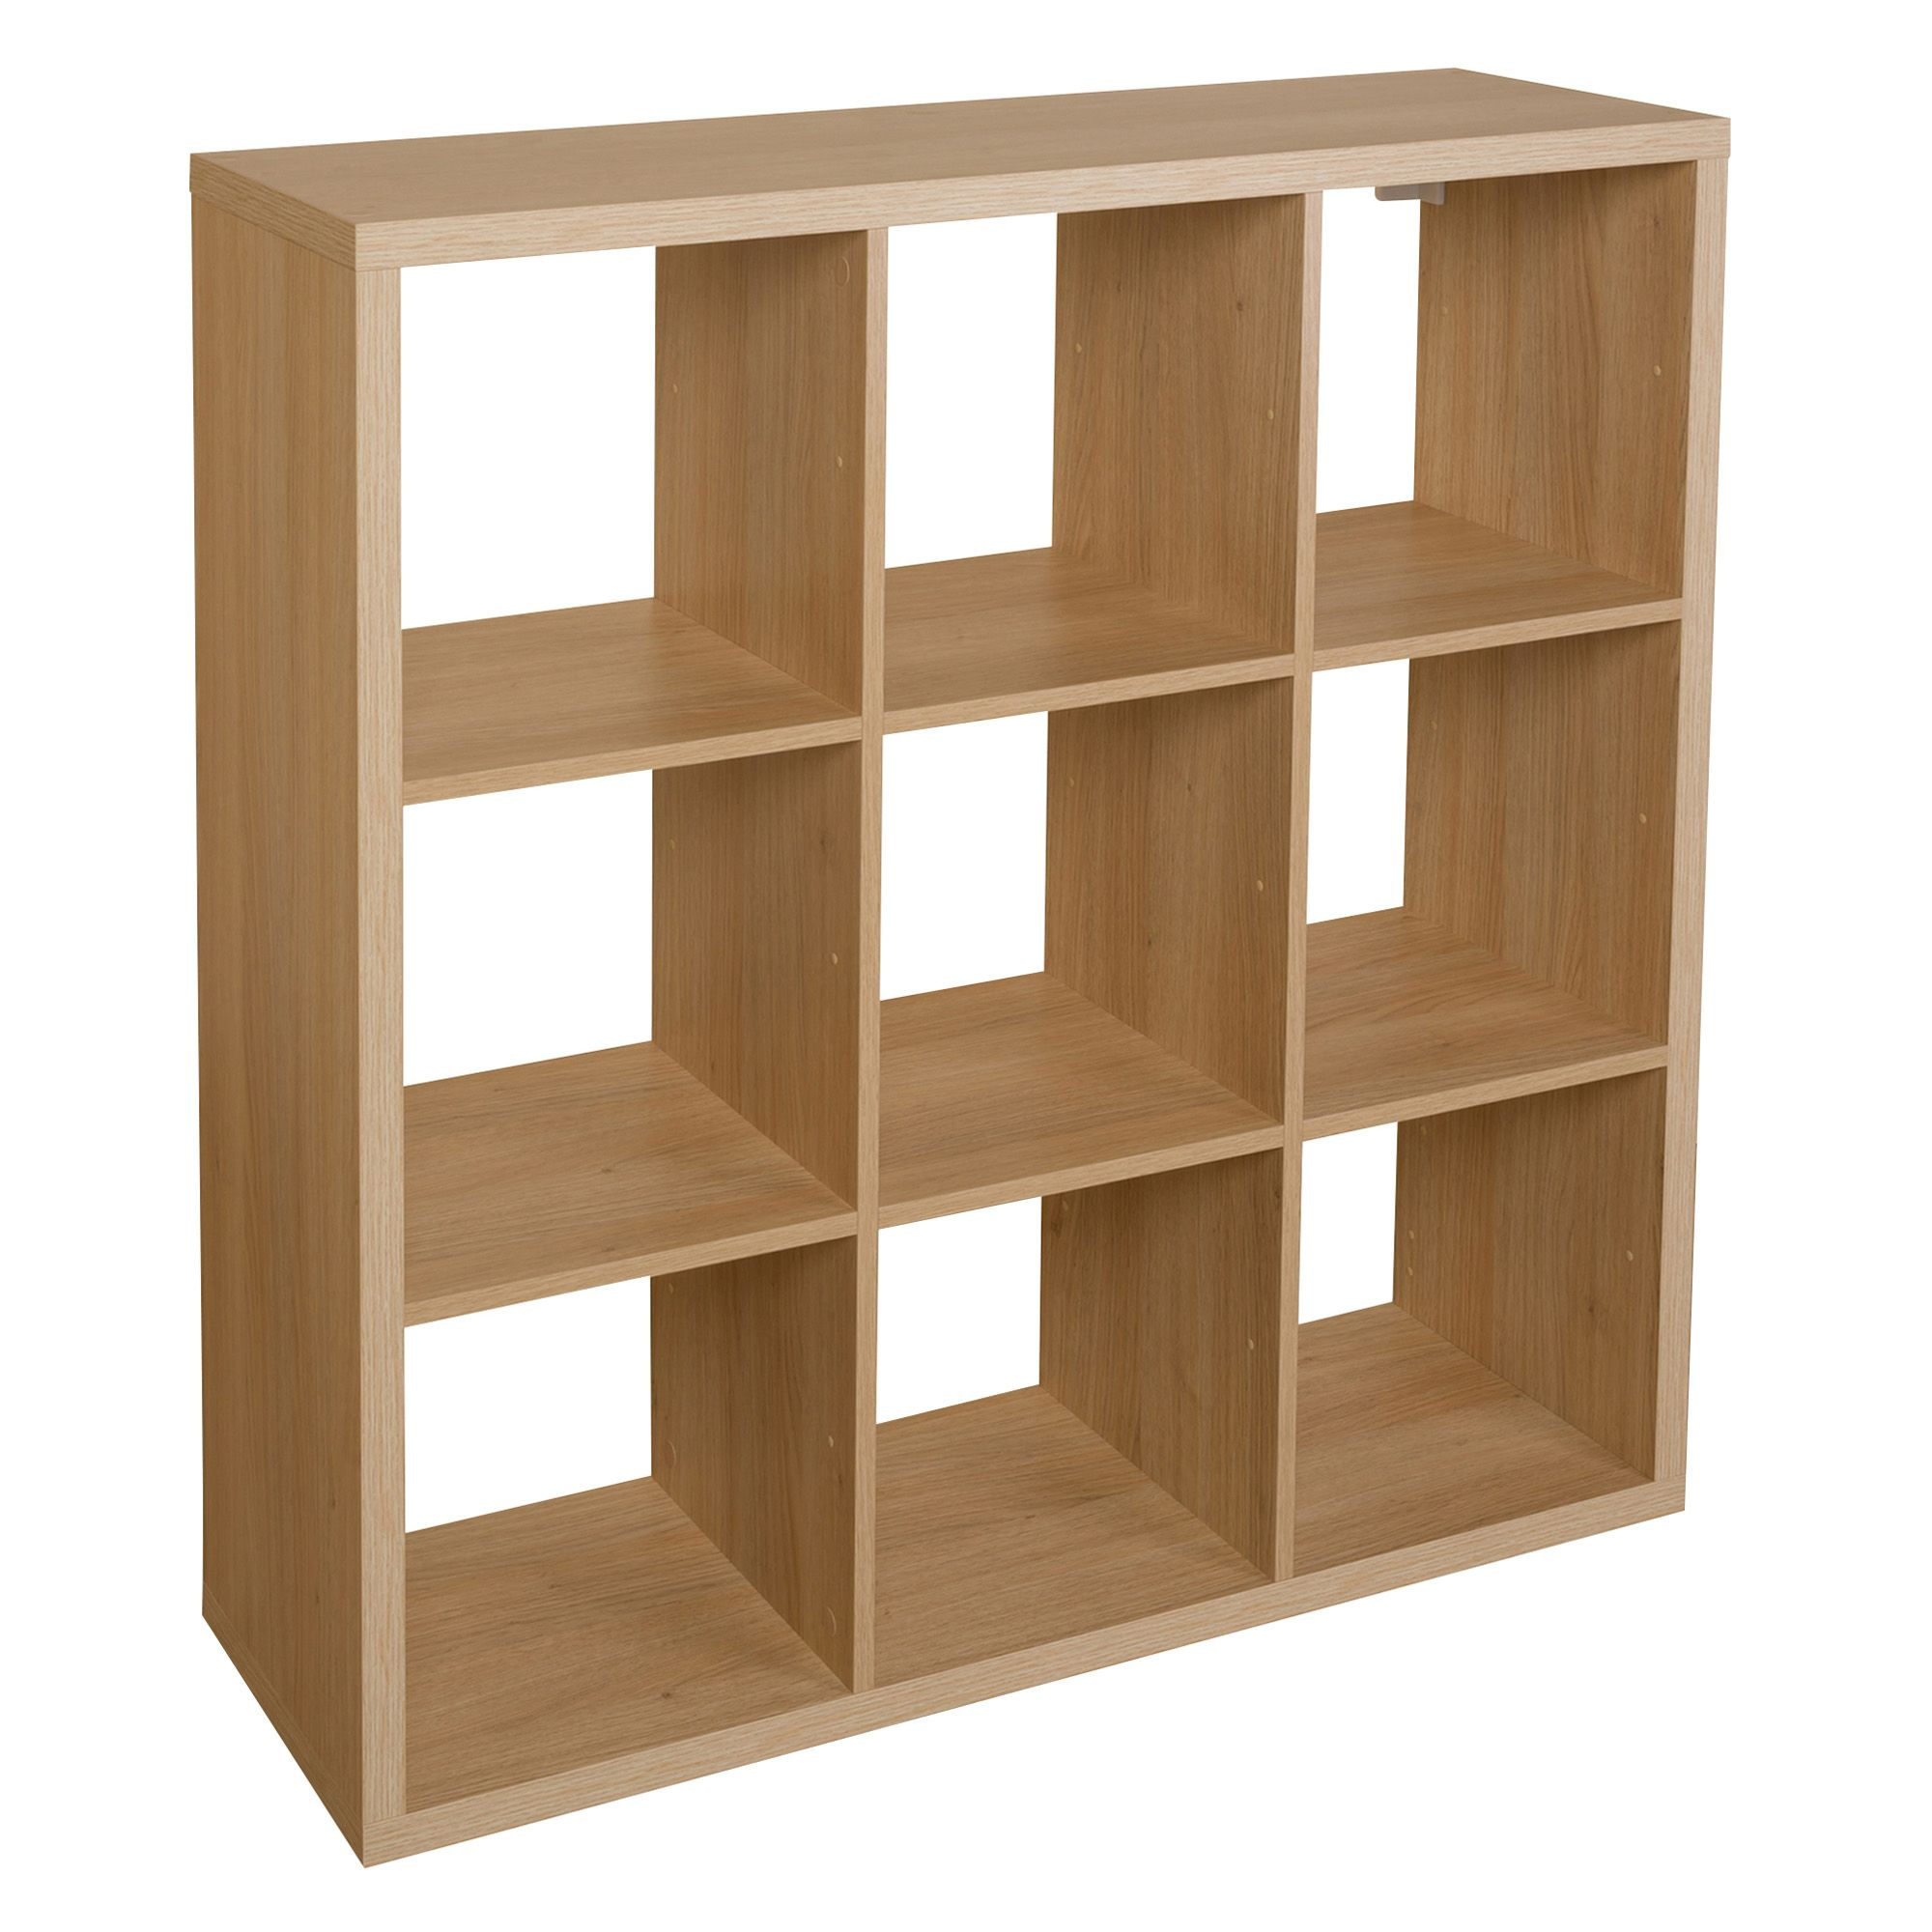 Superieur Form Mixxit Oak Effect 9 Cube Shelving Unit (H)1080mm (W)1080mm |  Departments | DIY At Bu0026Q